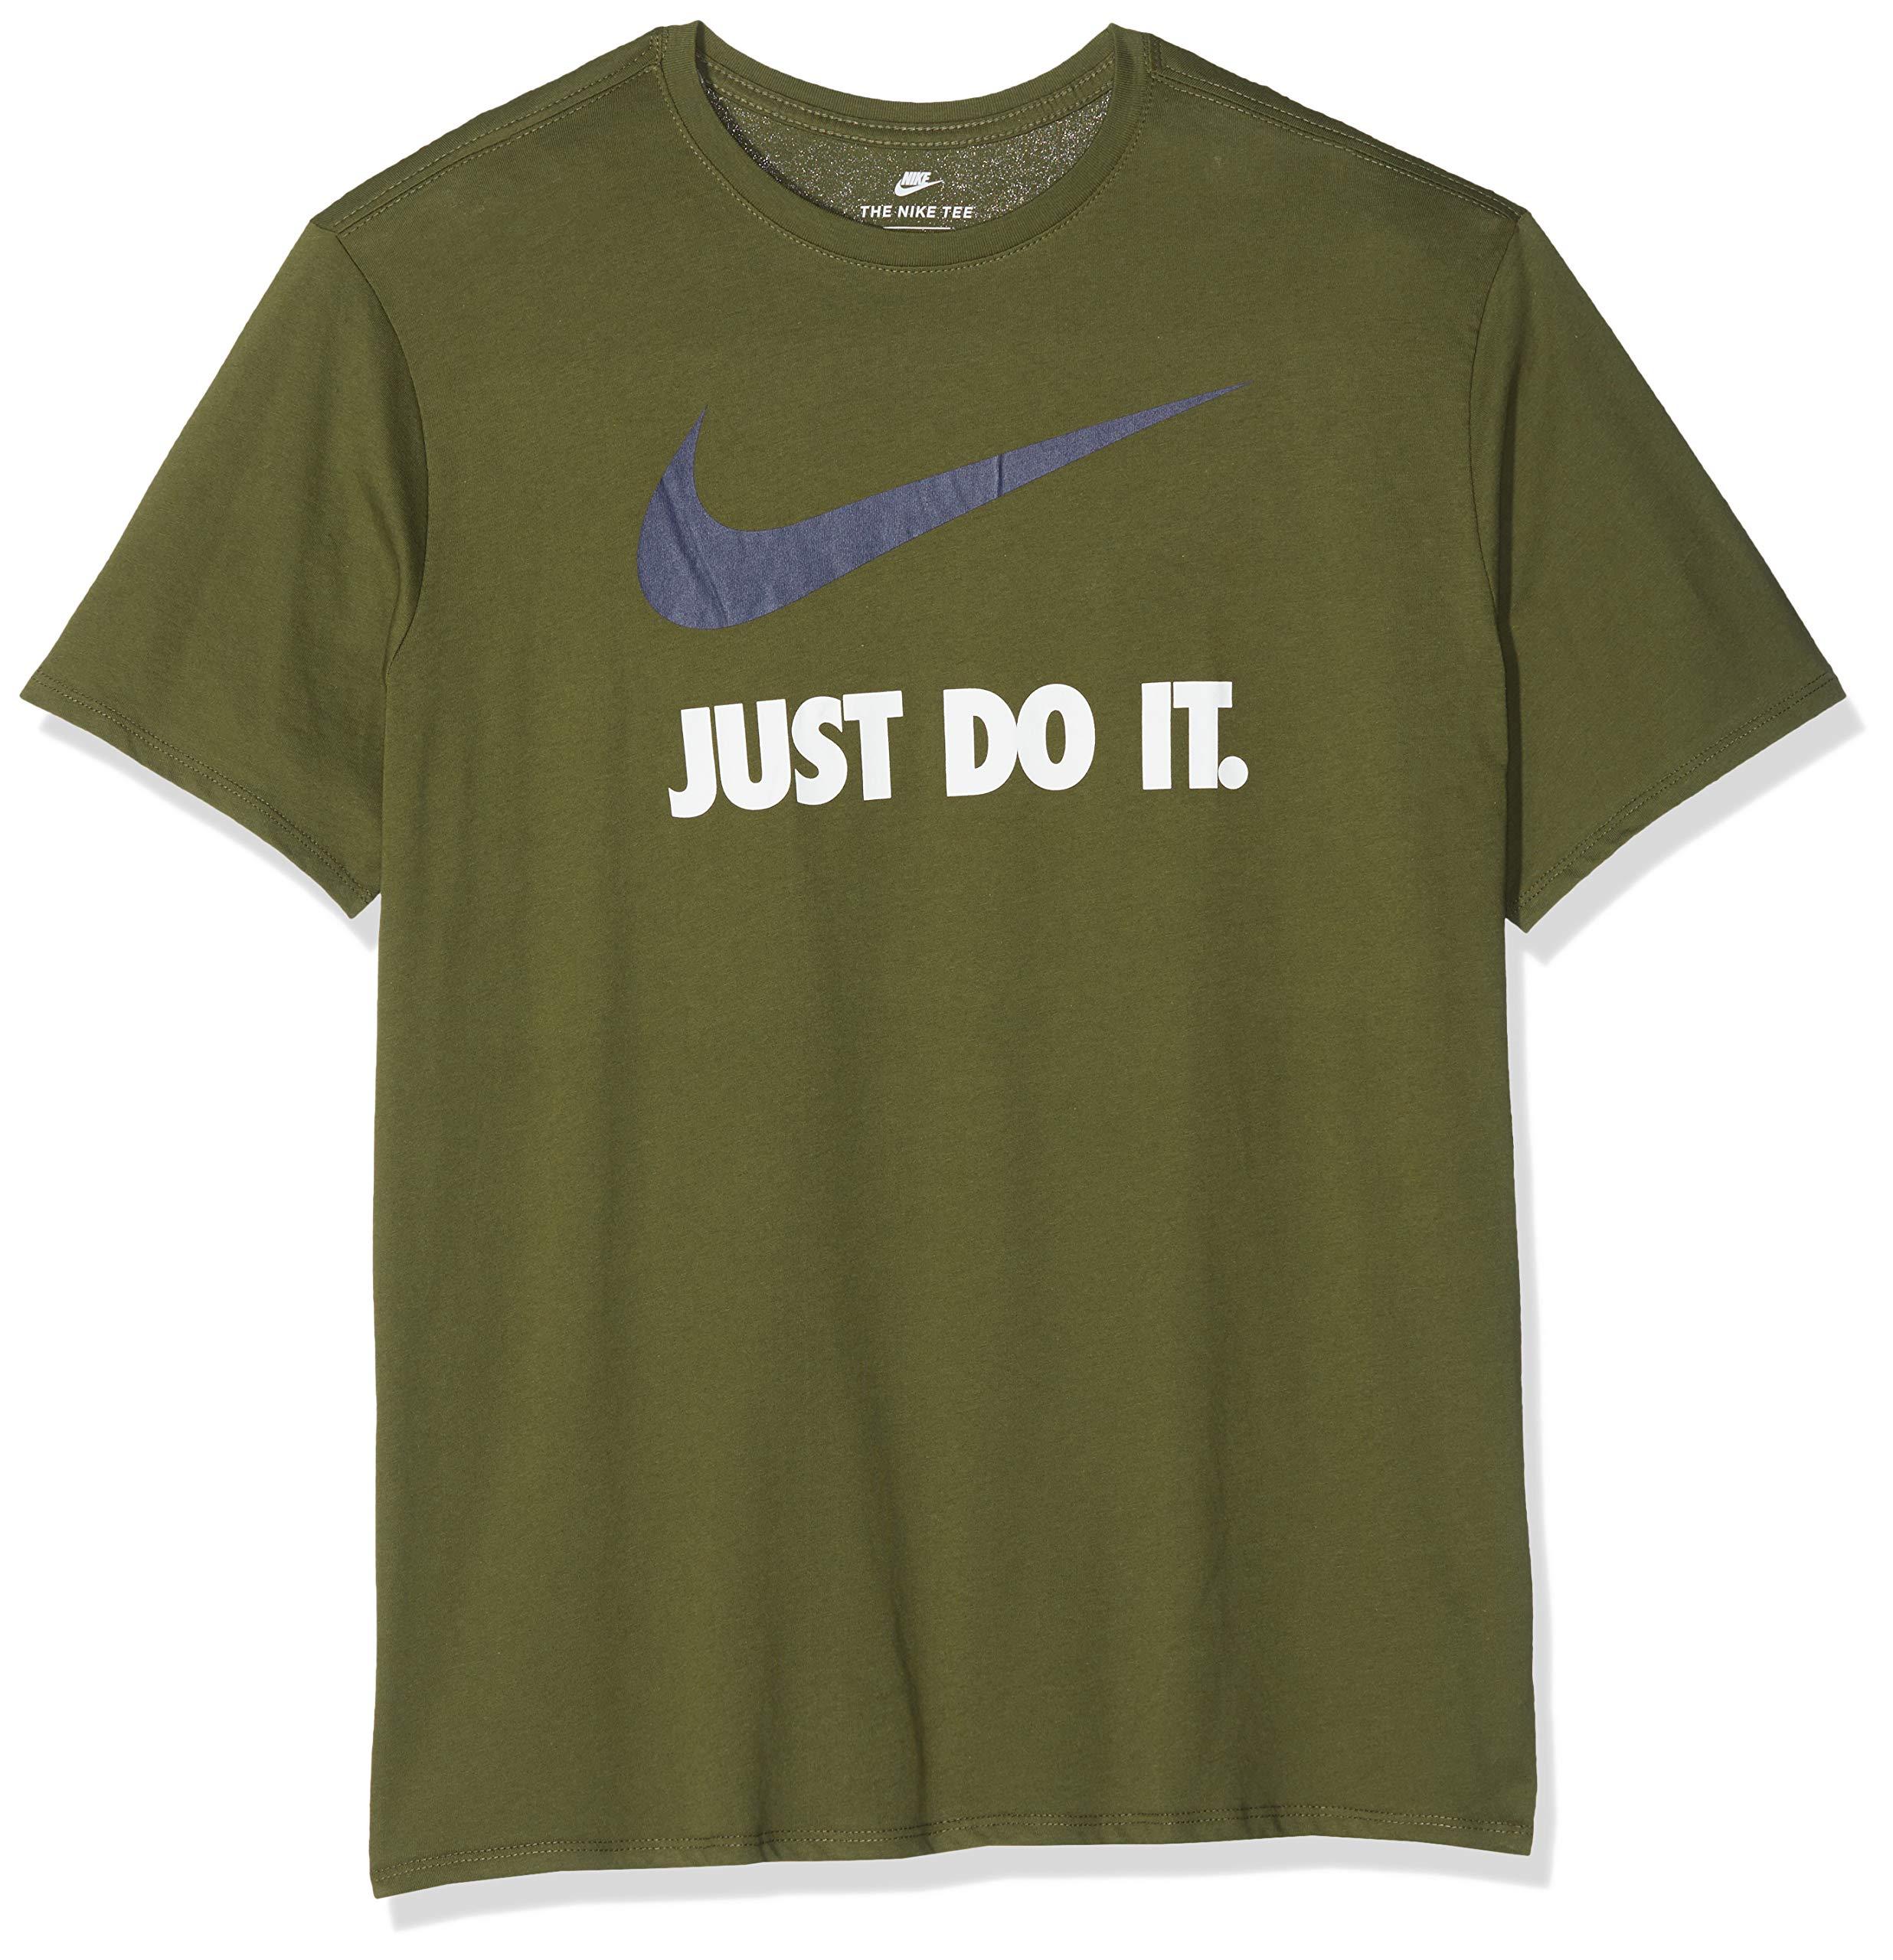 Nike Men's Just Do It Swoosh T-Shirt (Olive Canvas/Obsidian, S)